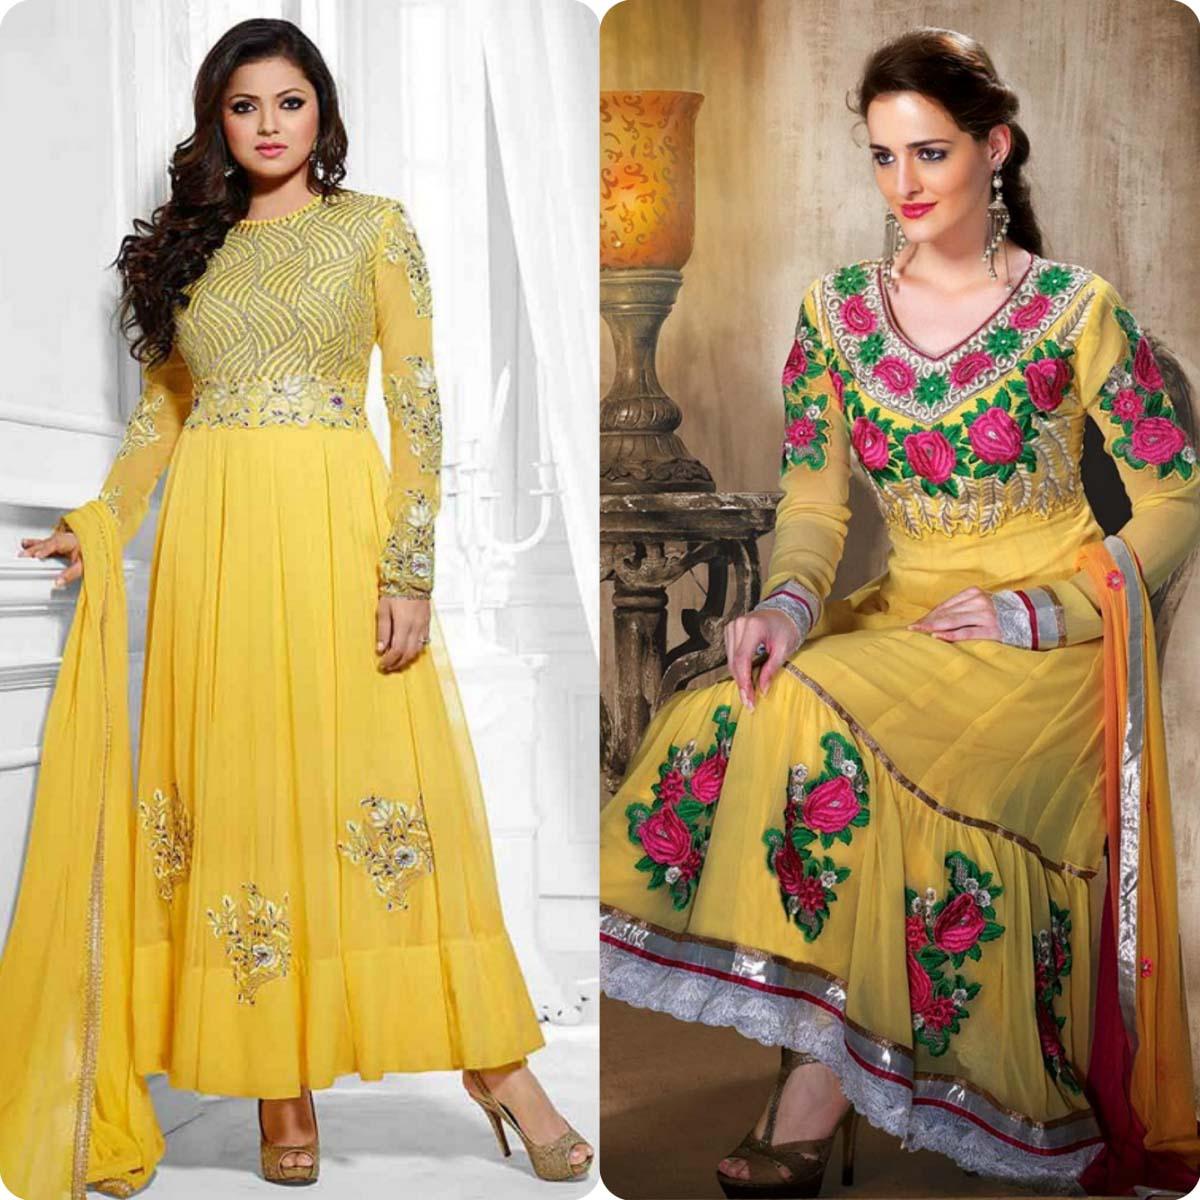 Indian Stylish Umbrella Frock and Churidar Dresses for Girls 2016-2017 (7)